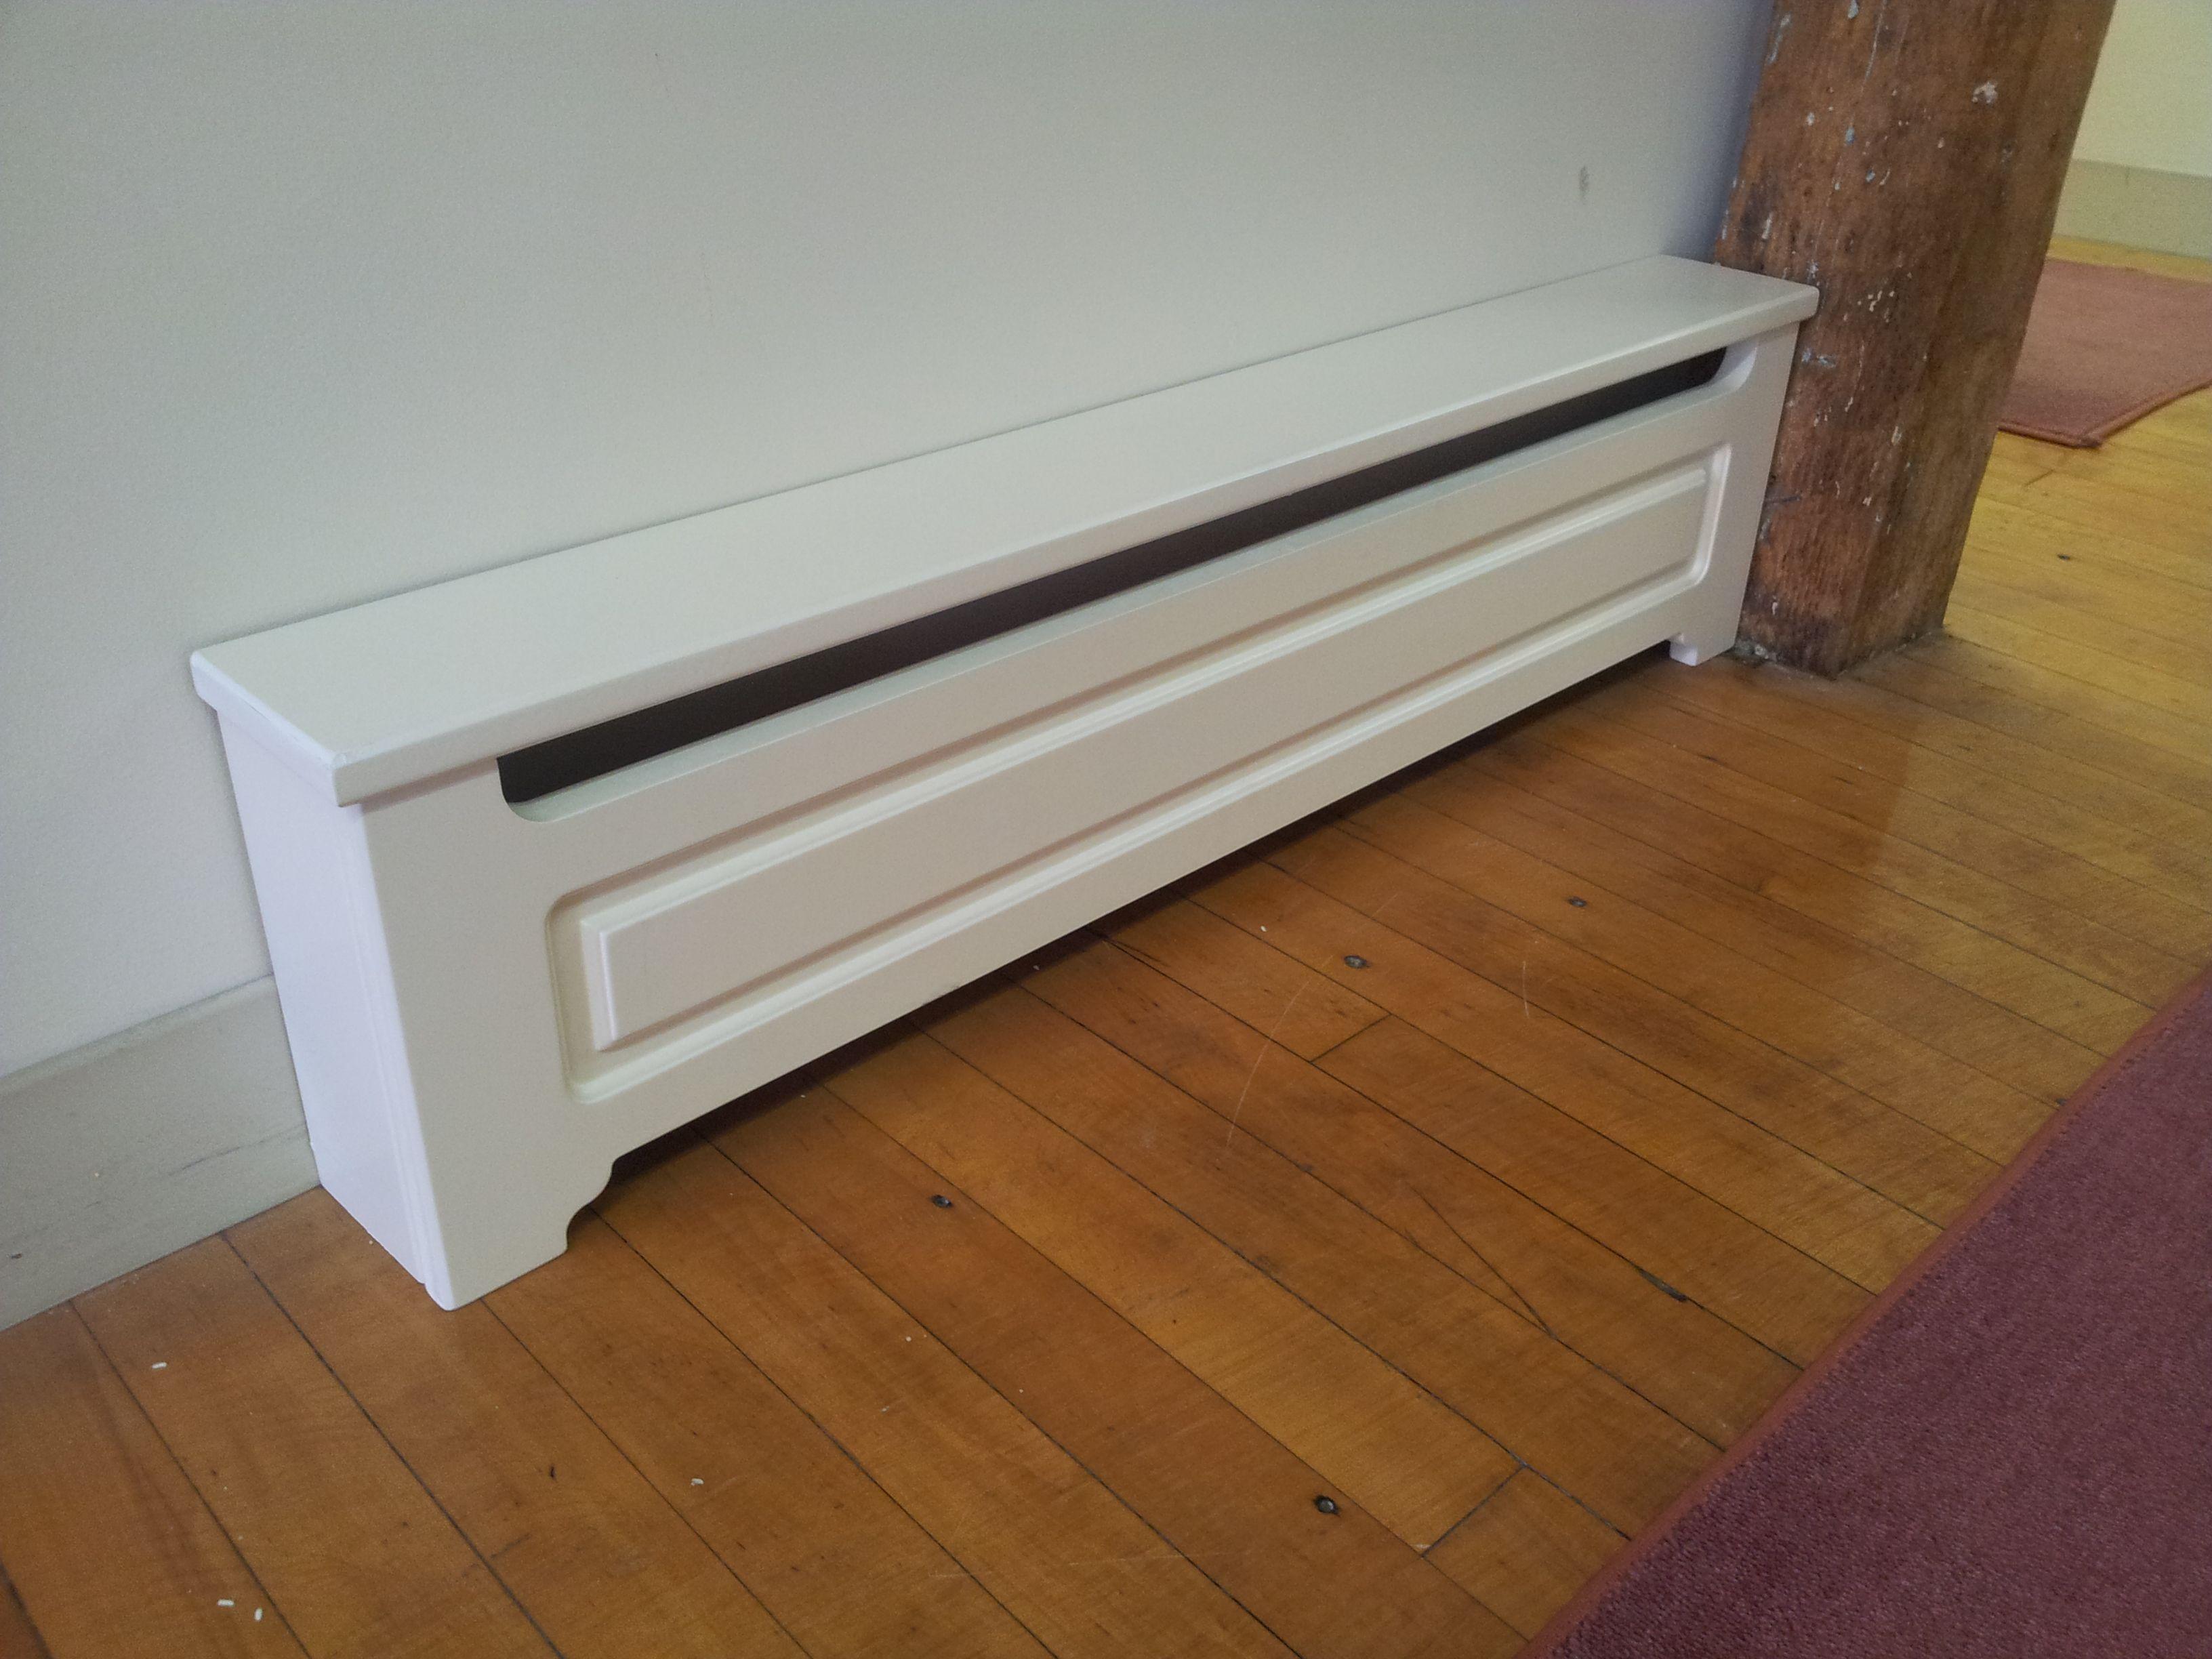 Jays Custom Baseboard Covers Radiator Covers And More Baseboard Heater Covers Heater Cover Baseboard Heating